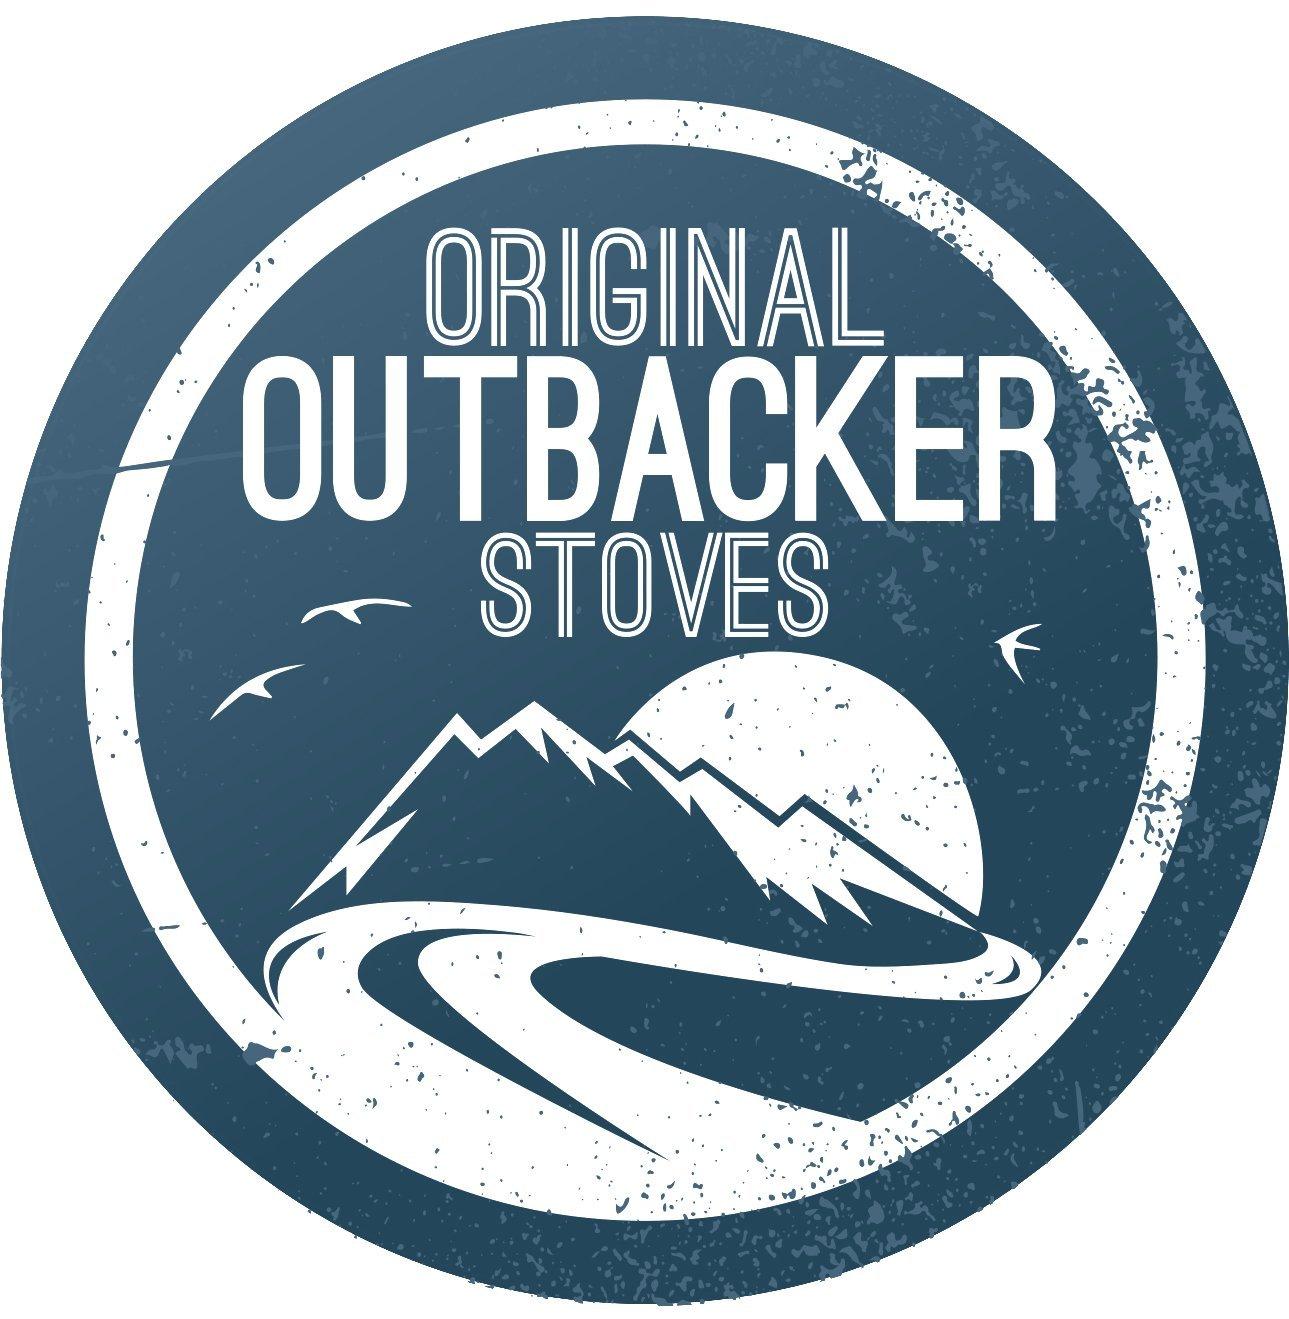 Outbacker 'Firebox' Portable Wood Burning Stove 9